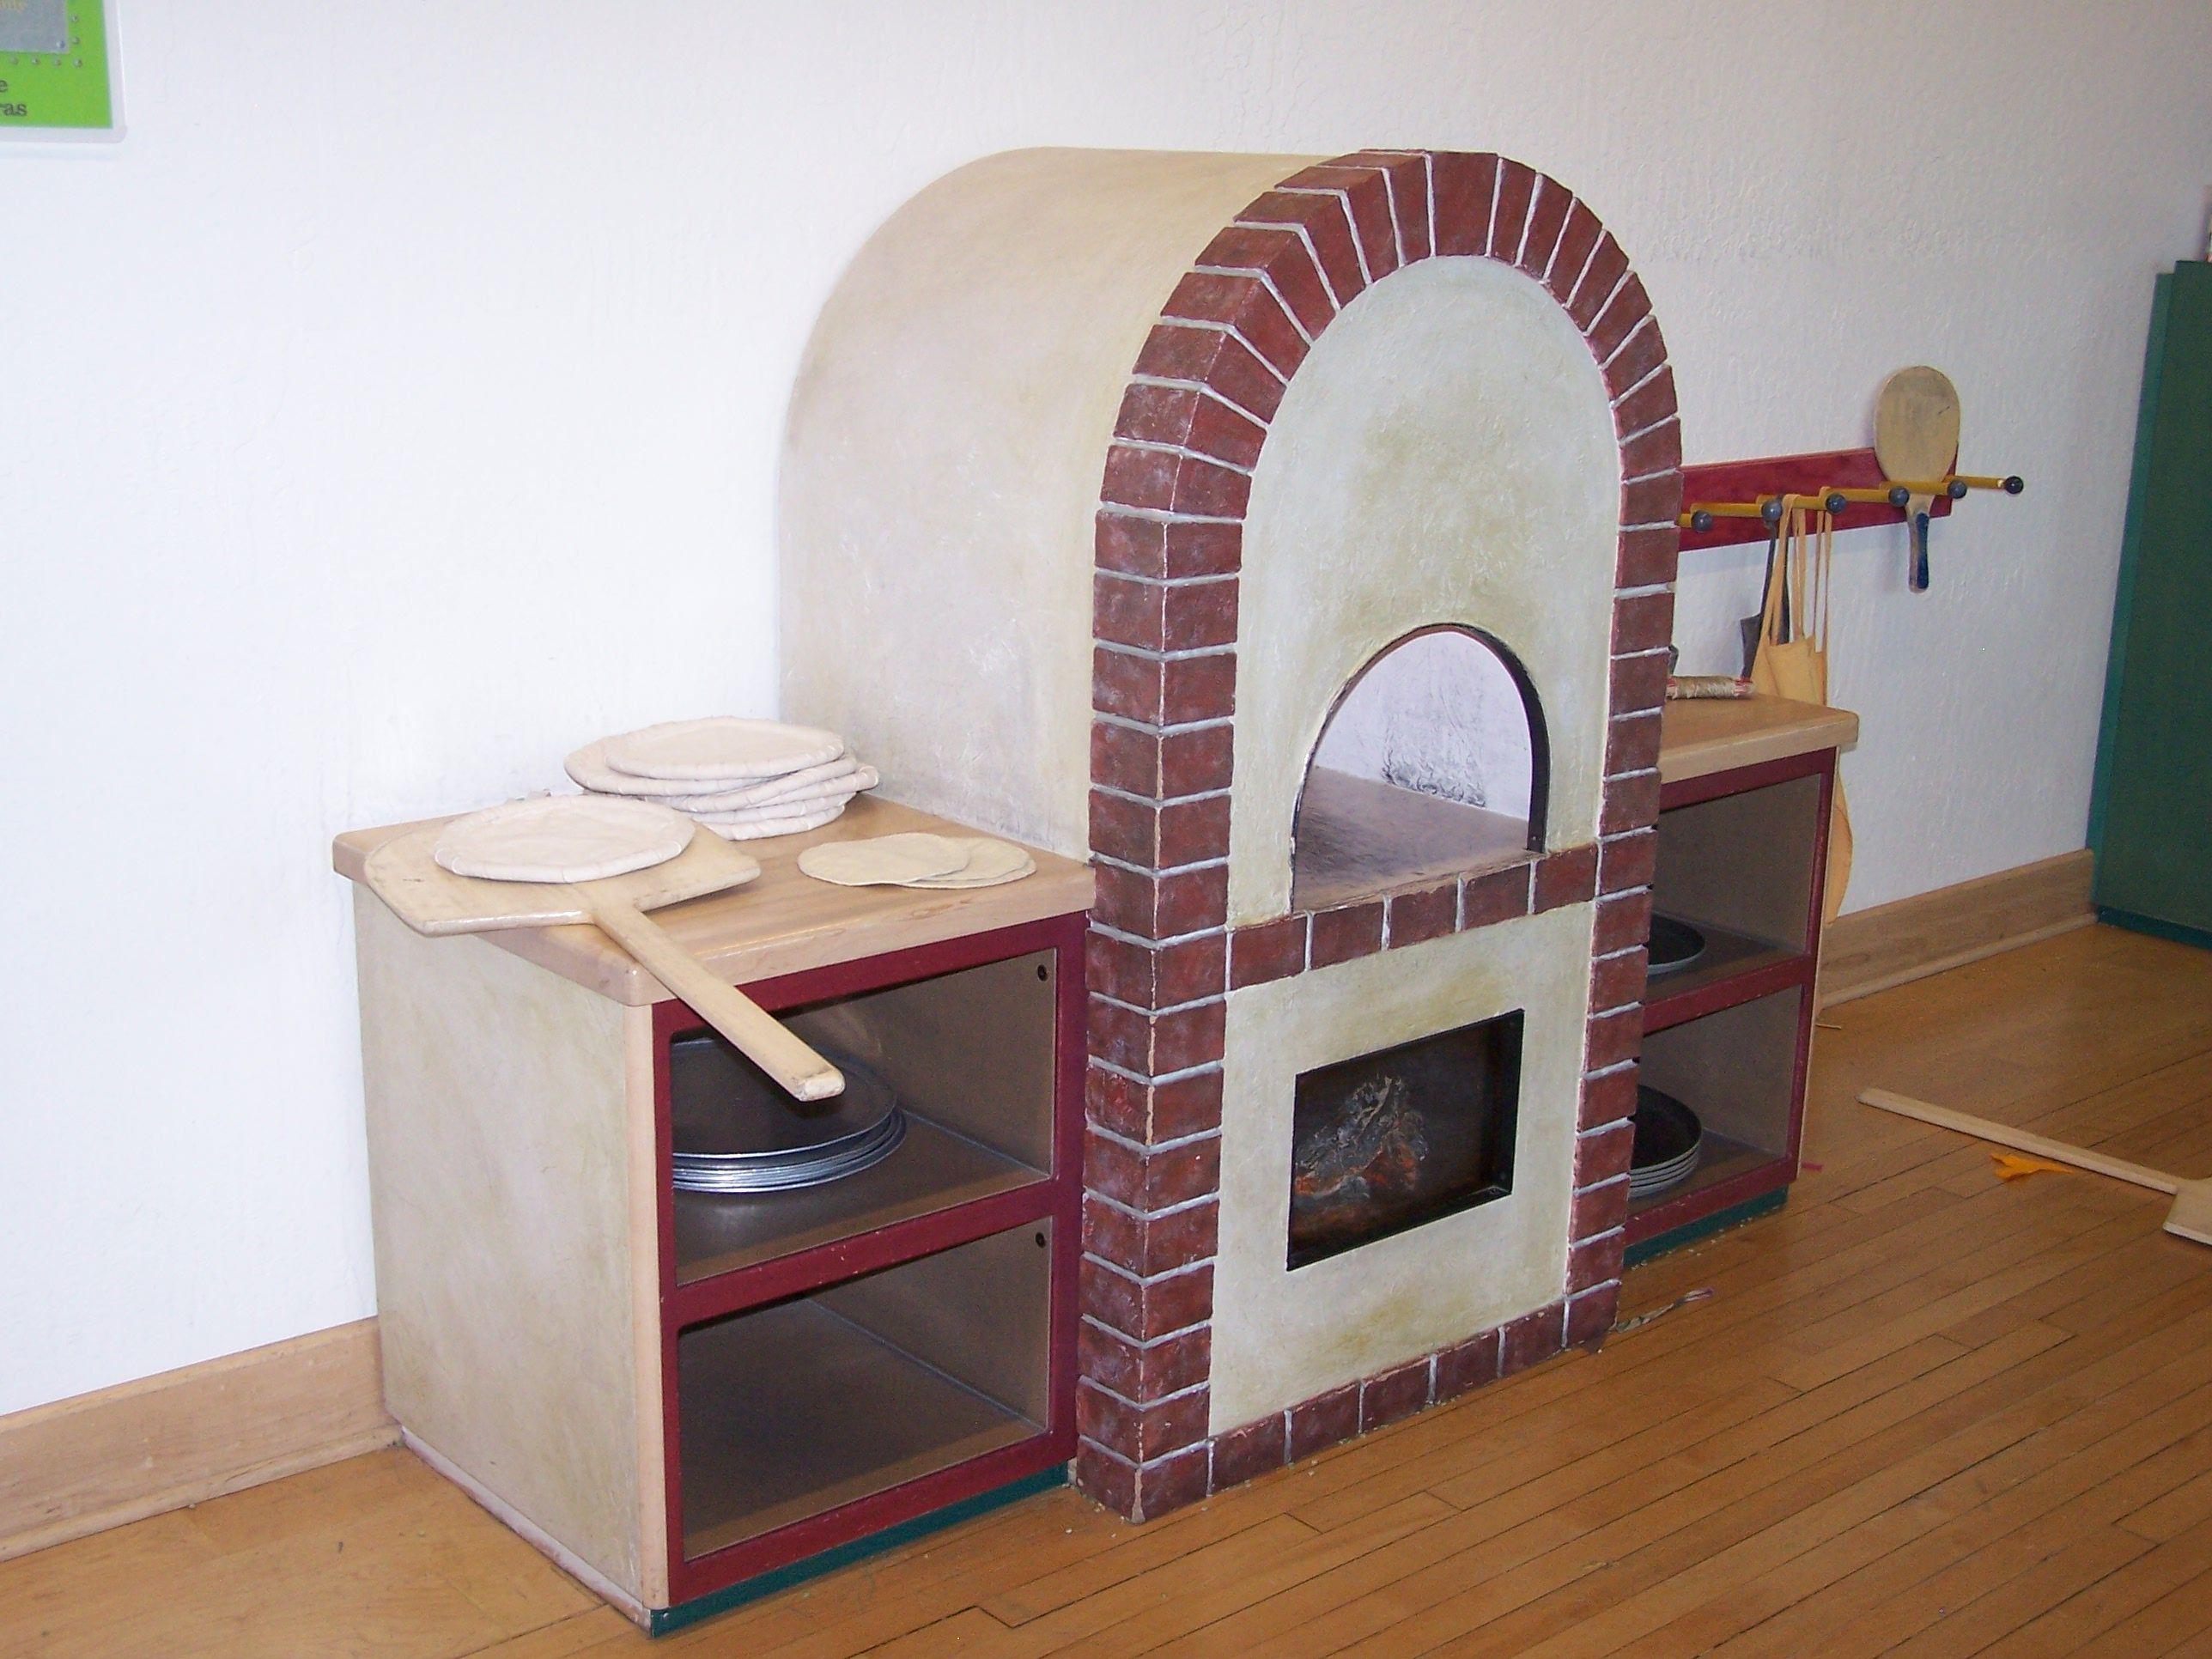 Image Result For Kids Pizza Ovens